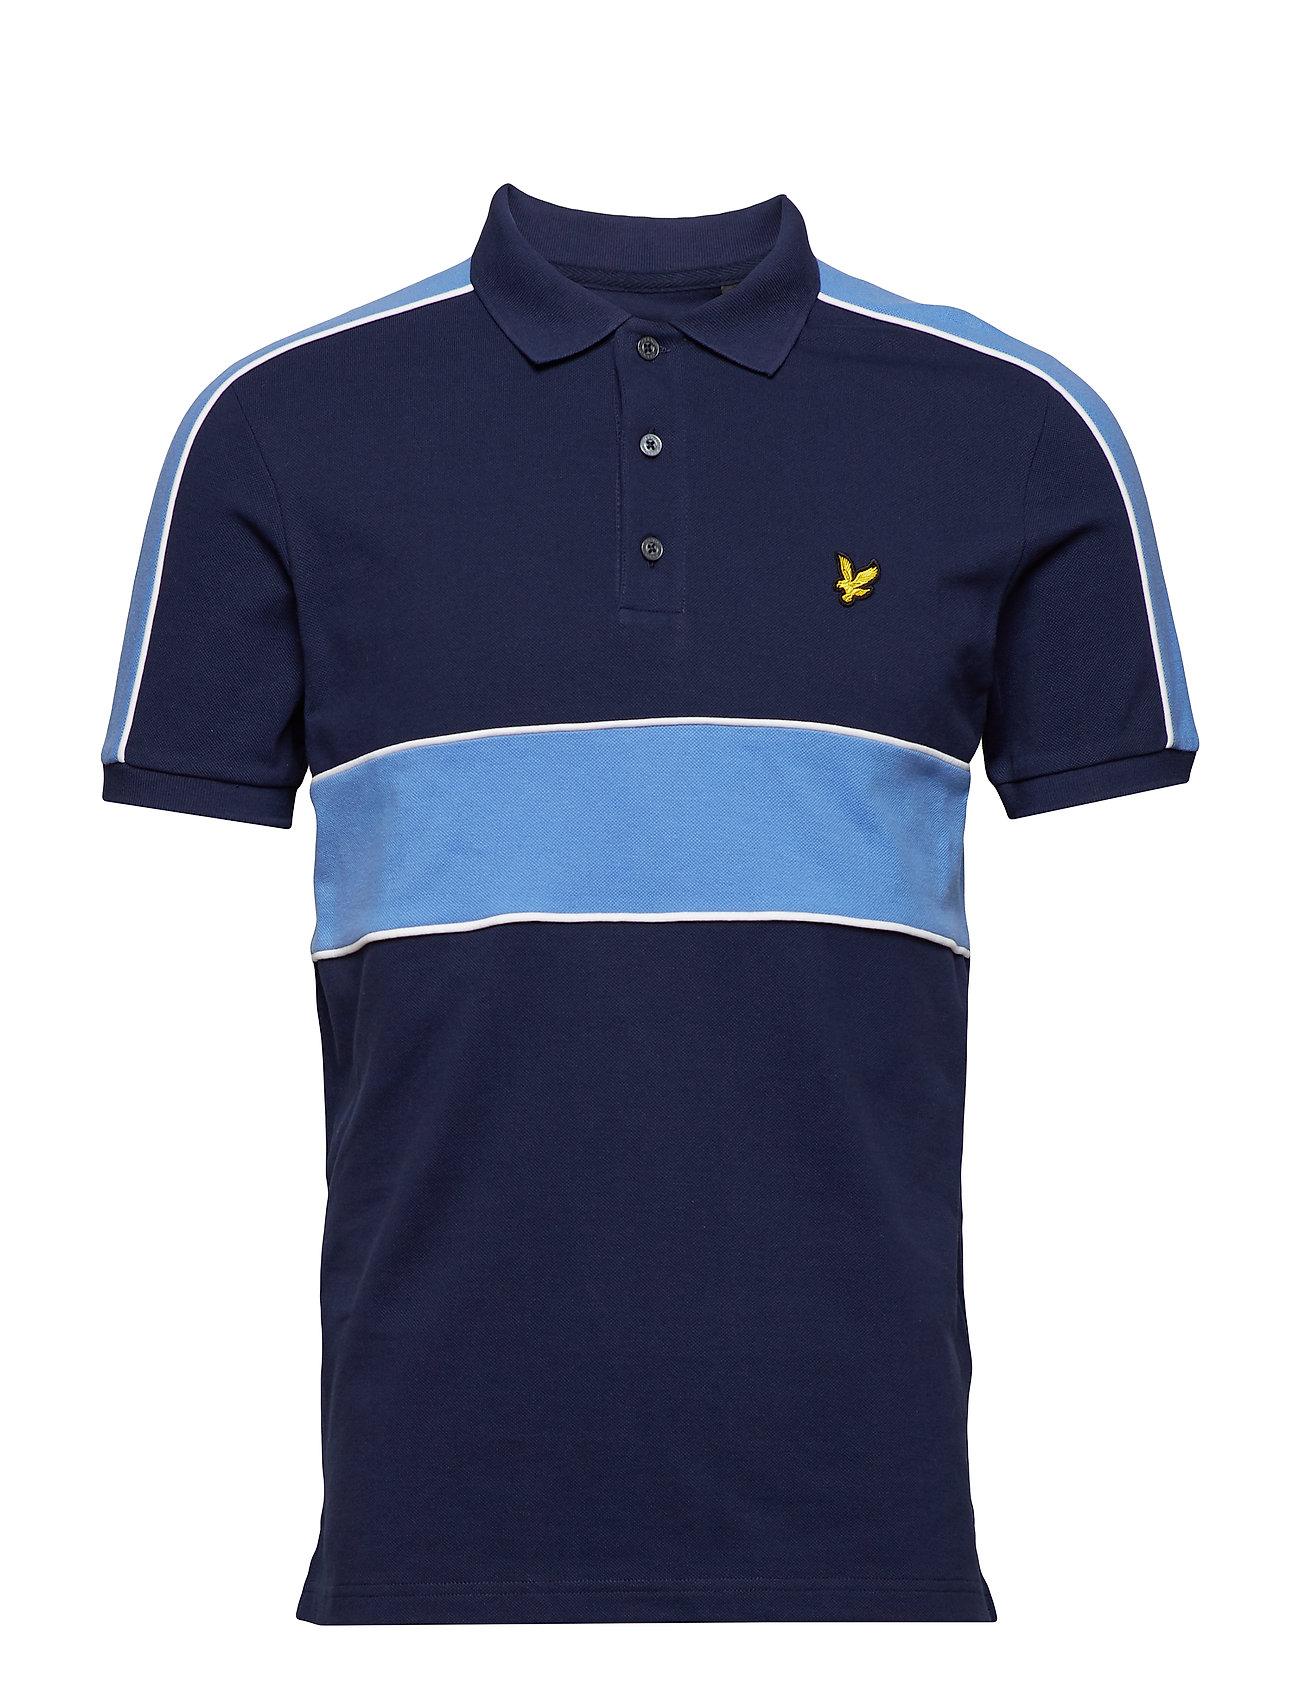 Lyle & Scott Cut and Sew Polo Shirt Ögrönlar